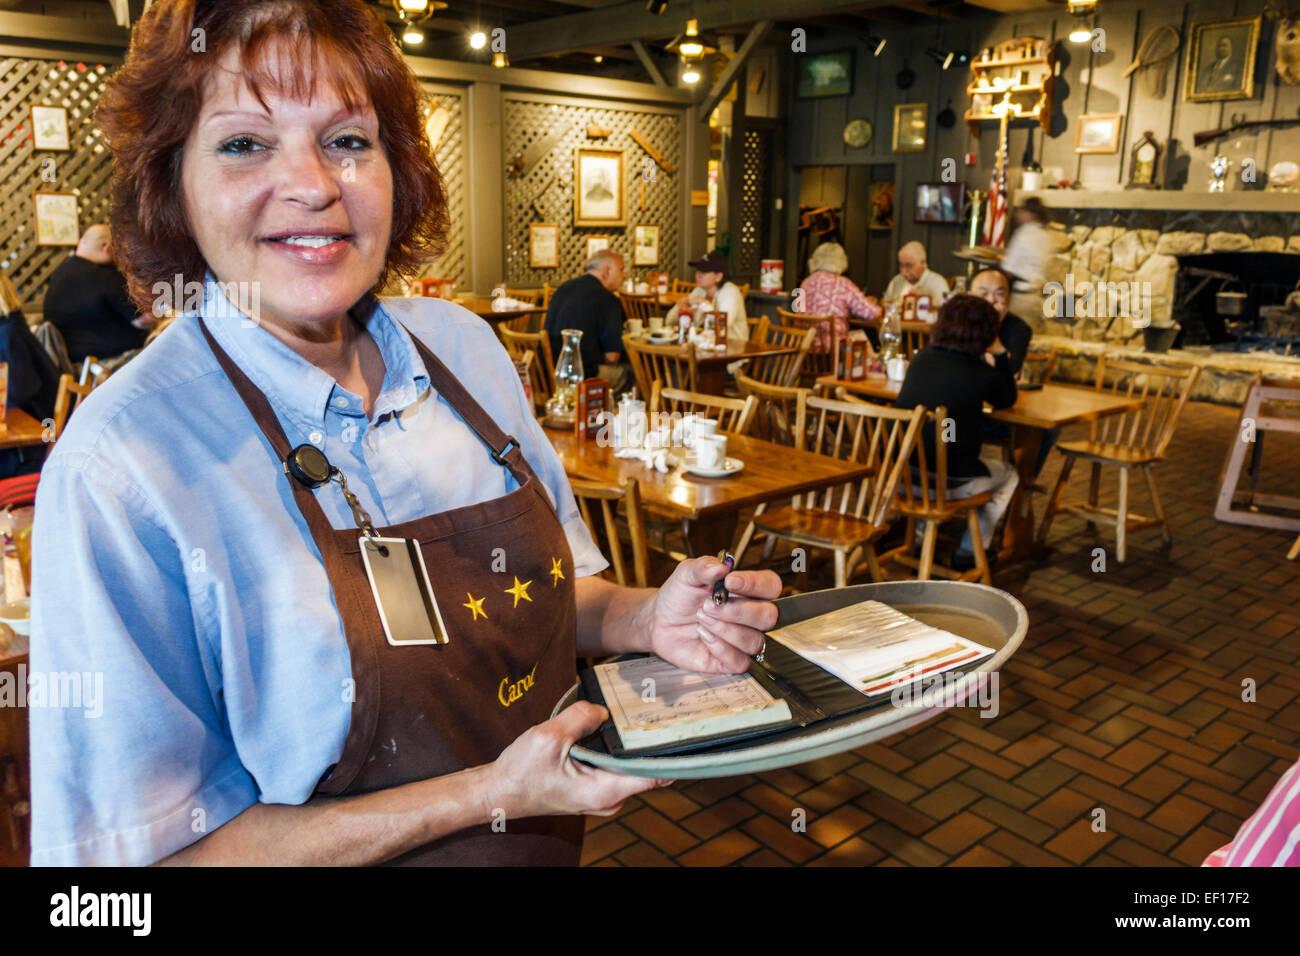 Vero Beach Florida Cracker Barrel Country Store Restaurant Frau Kellnerin bestellen Job arbeiten Mitarbeiter Stockbild